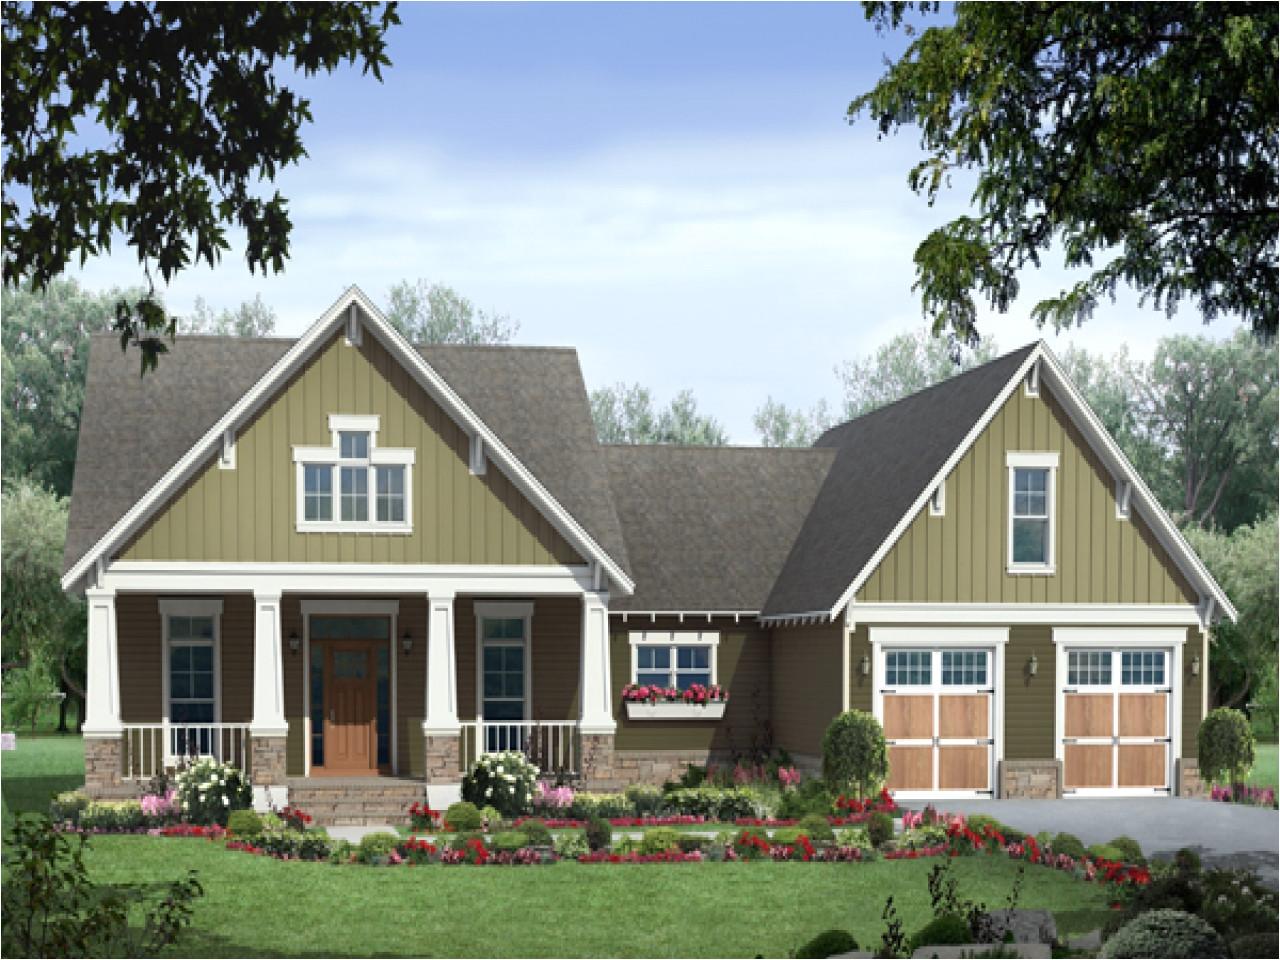 14c64fb32f174642 craftsman style house plans vintage craftsman house plans